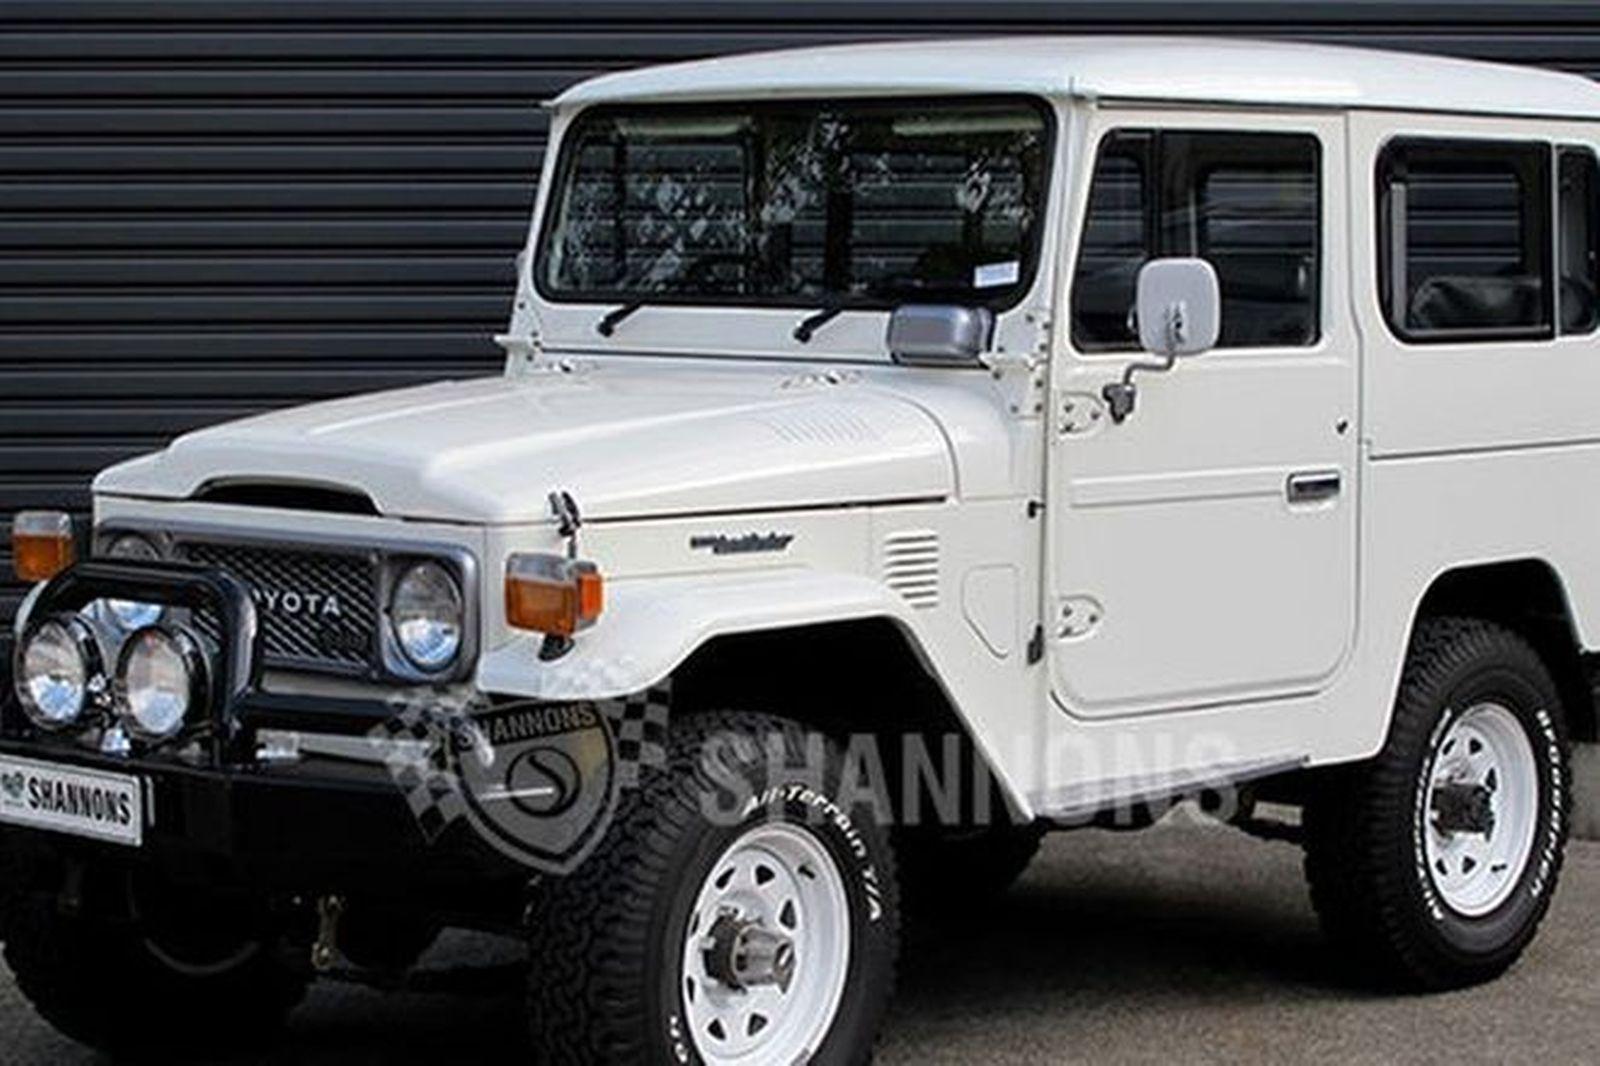 sold toyota bj42 swb landcruiser diesel auctions lot 4 shannons. Black Bedroom Furniture Sets. Home Design Ideas